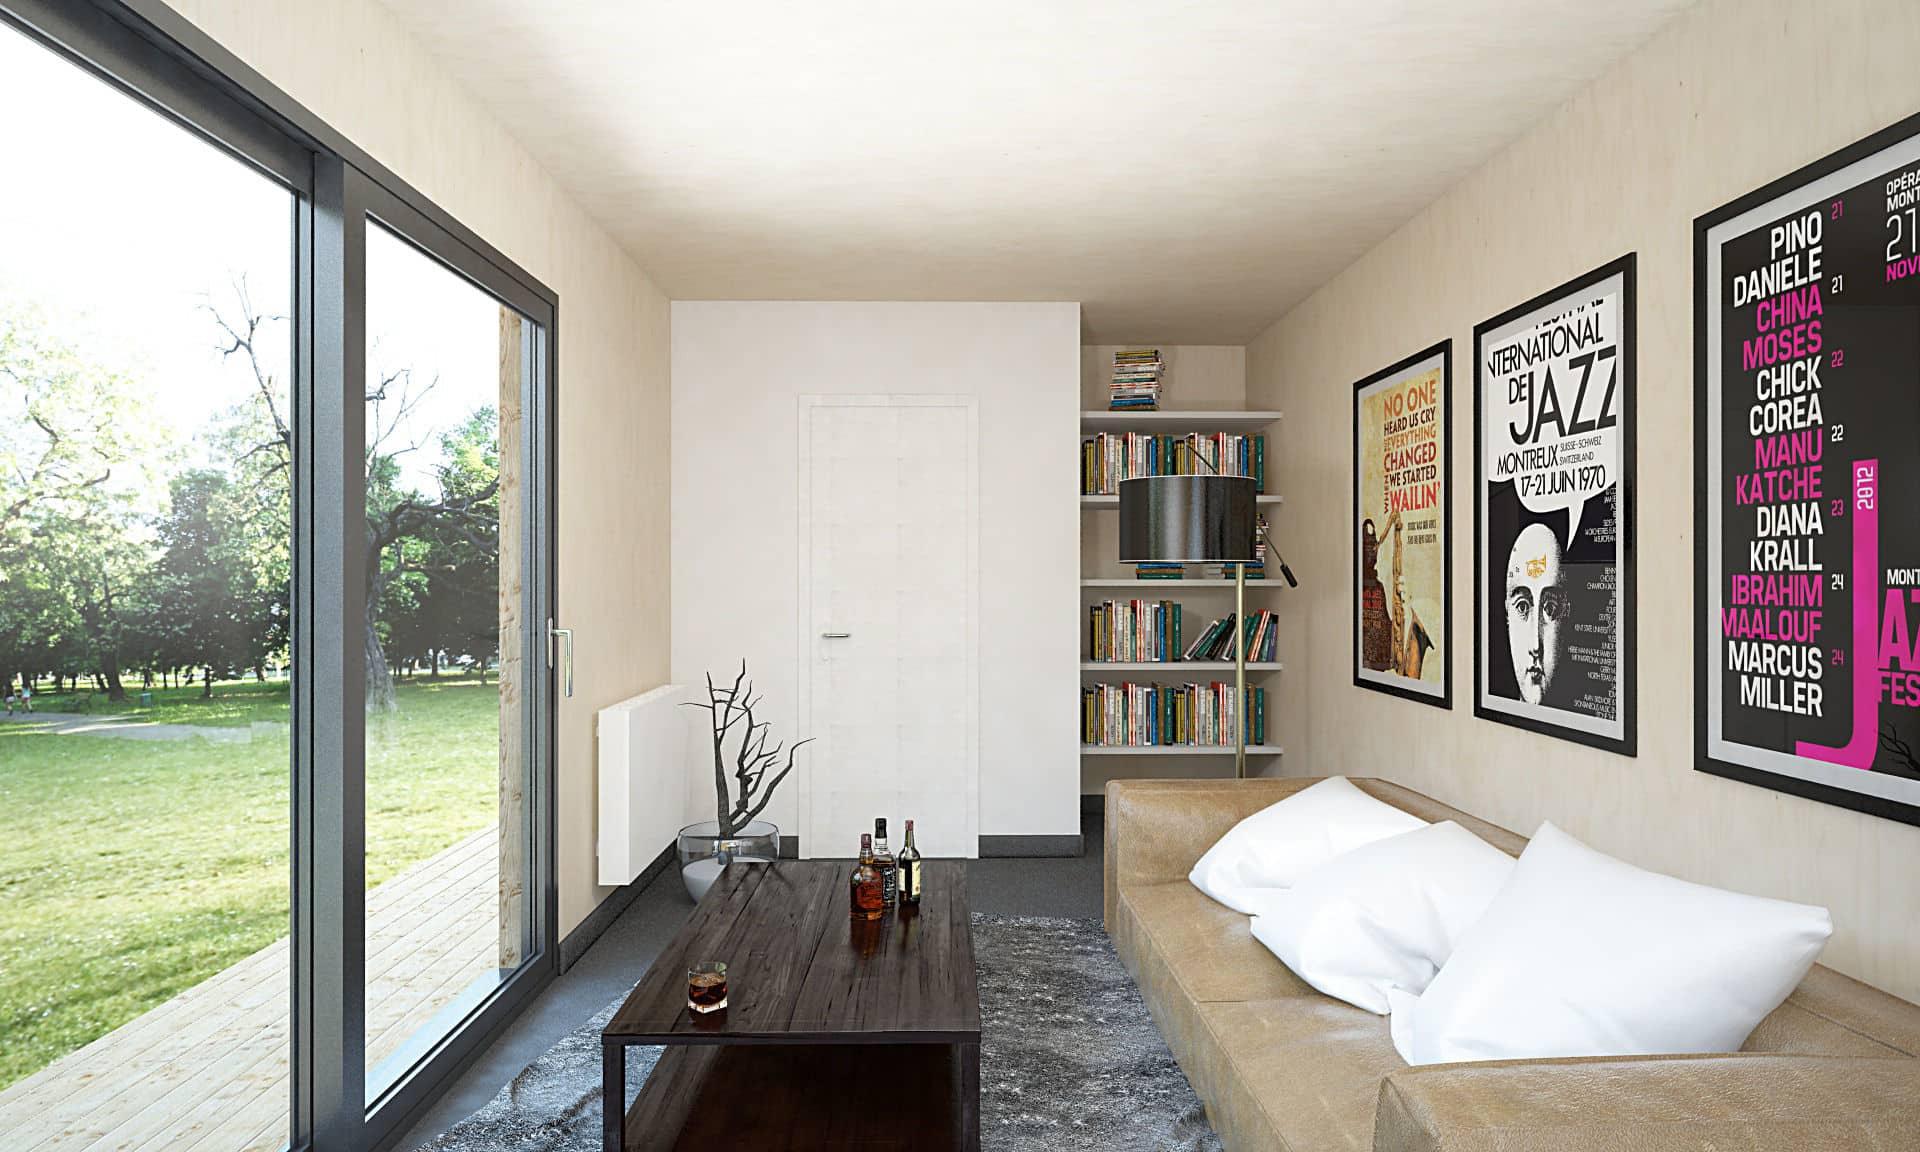 interieure studio de jardin 20m2 woodyloft - Studio de jardin 20m2 Couëron, proche Nantes 44